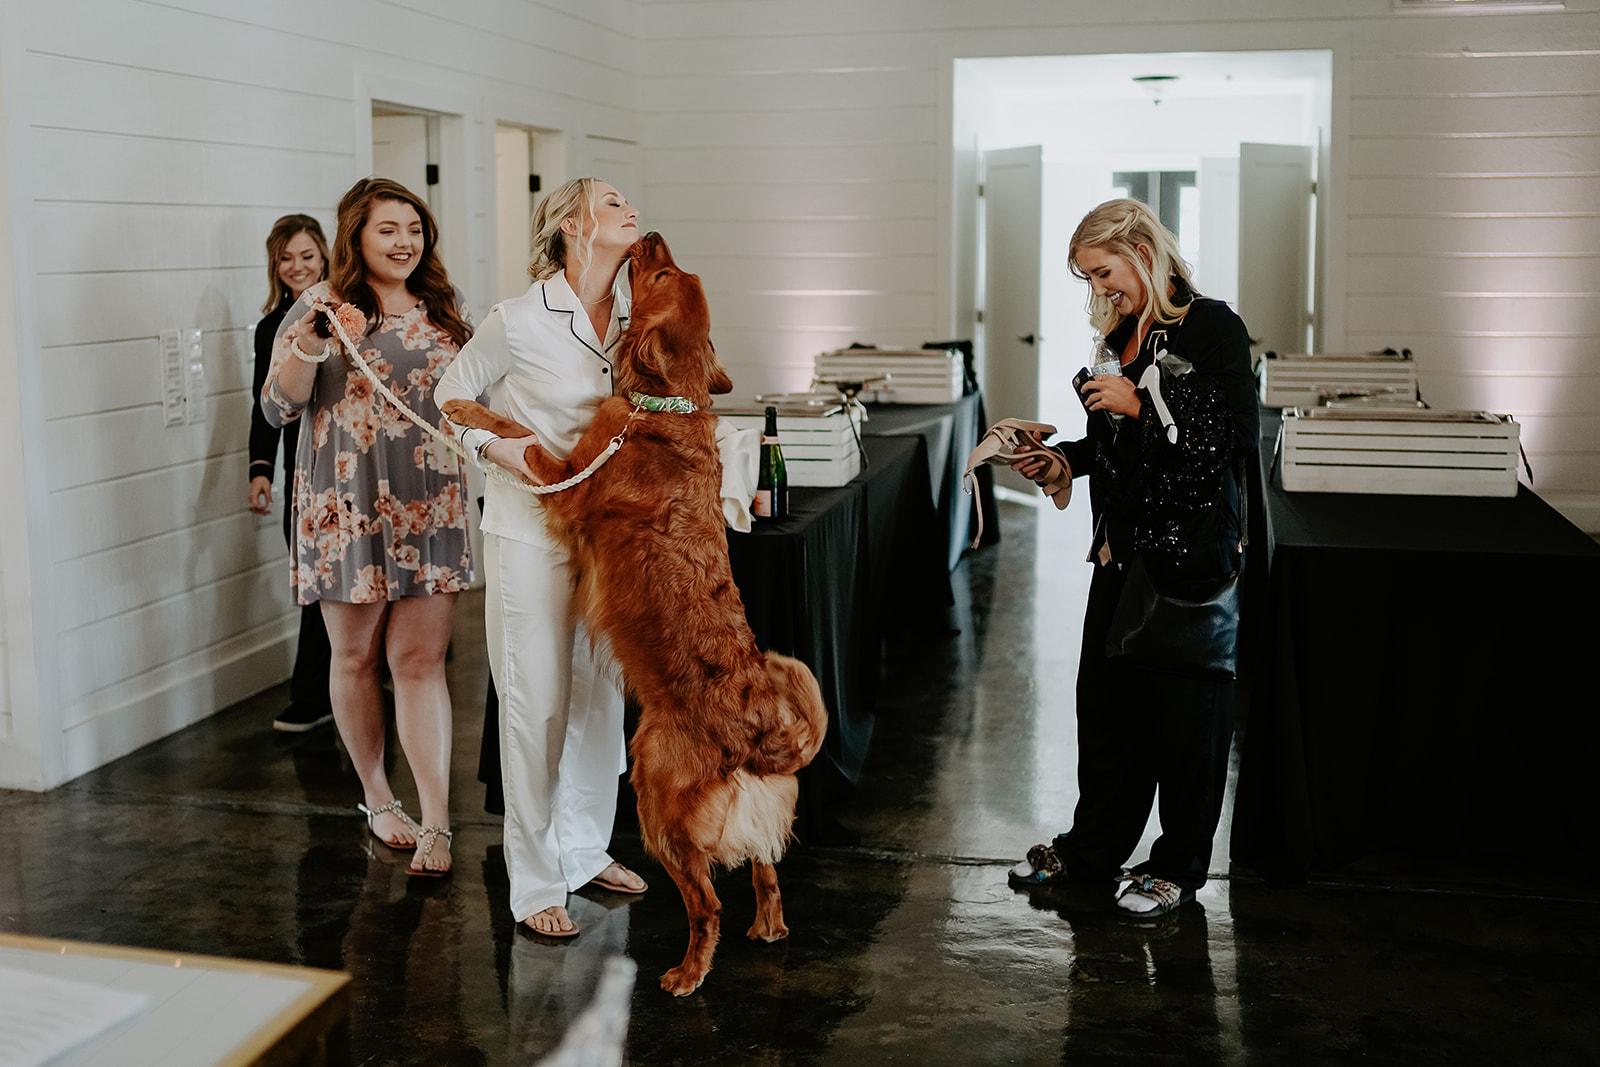 Oklahoma Outdoor Wedding Tulsa White Barn Venue 3.jpg